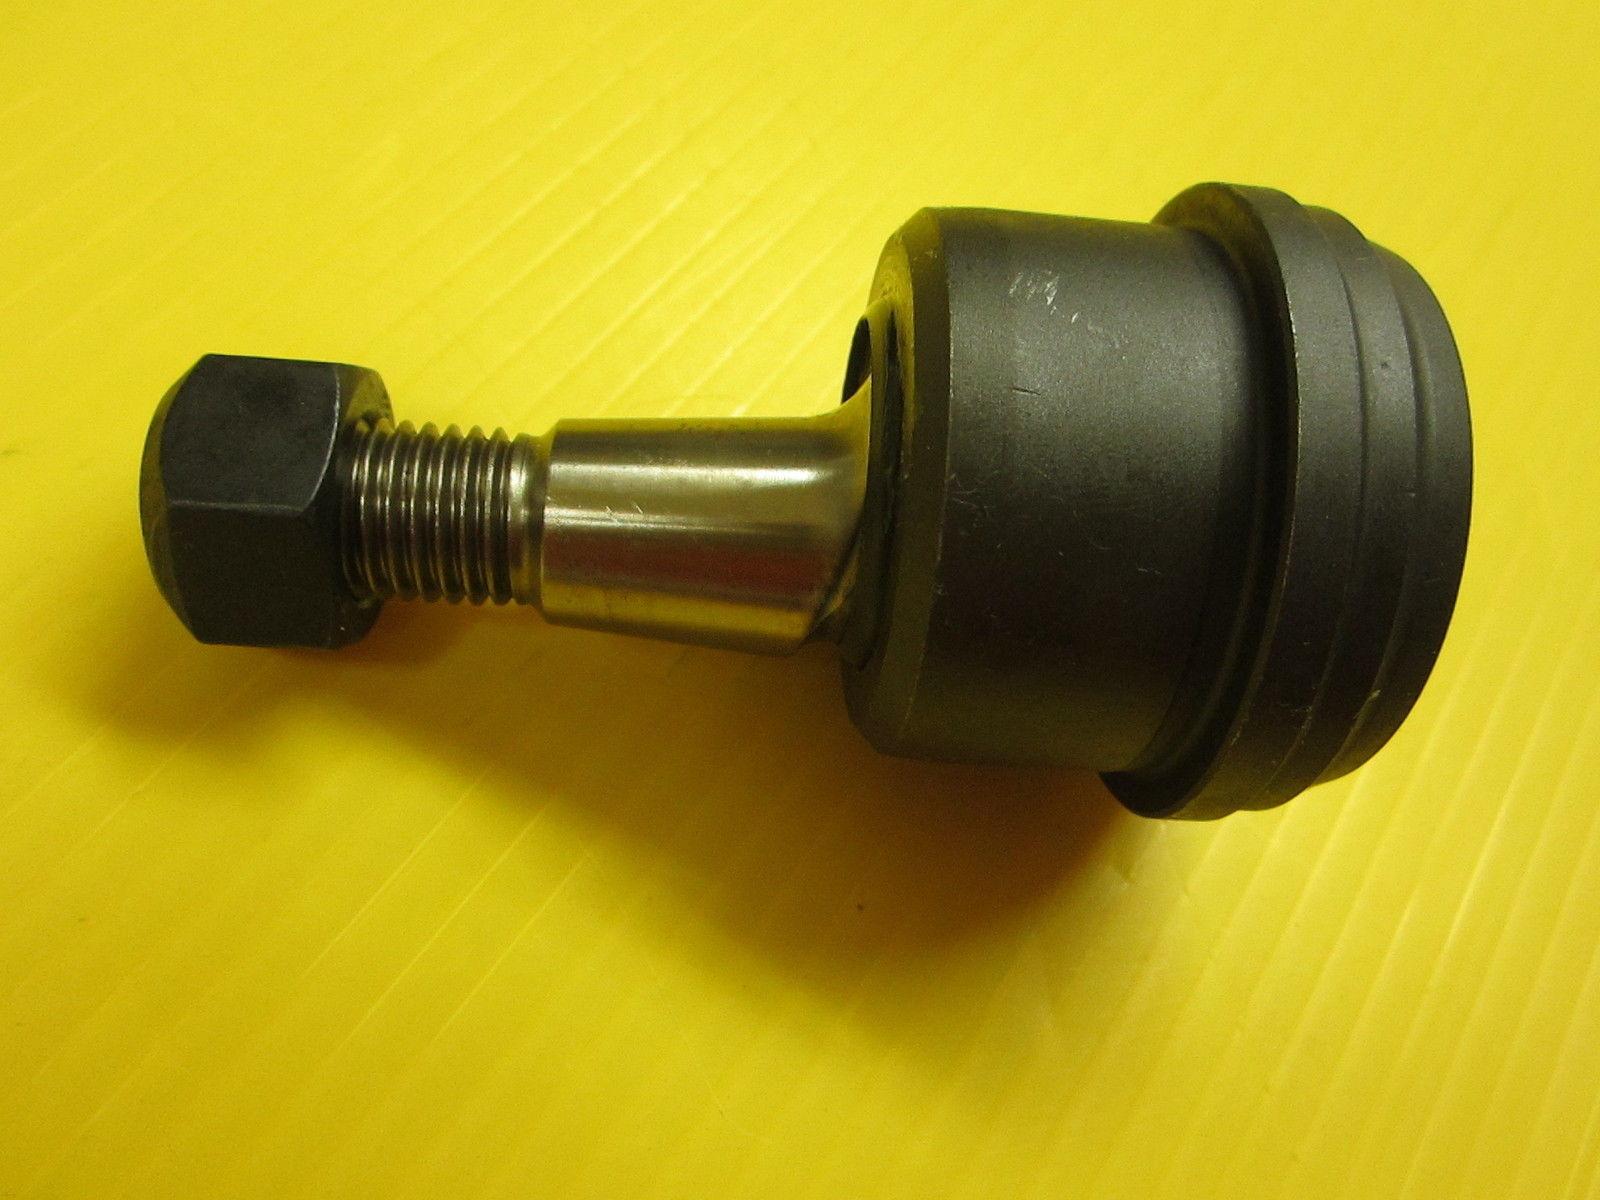 2 Upper Adjustable Xrf Brand Lifetime Warranty Ball Joints K7448